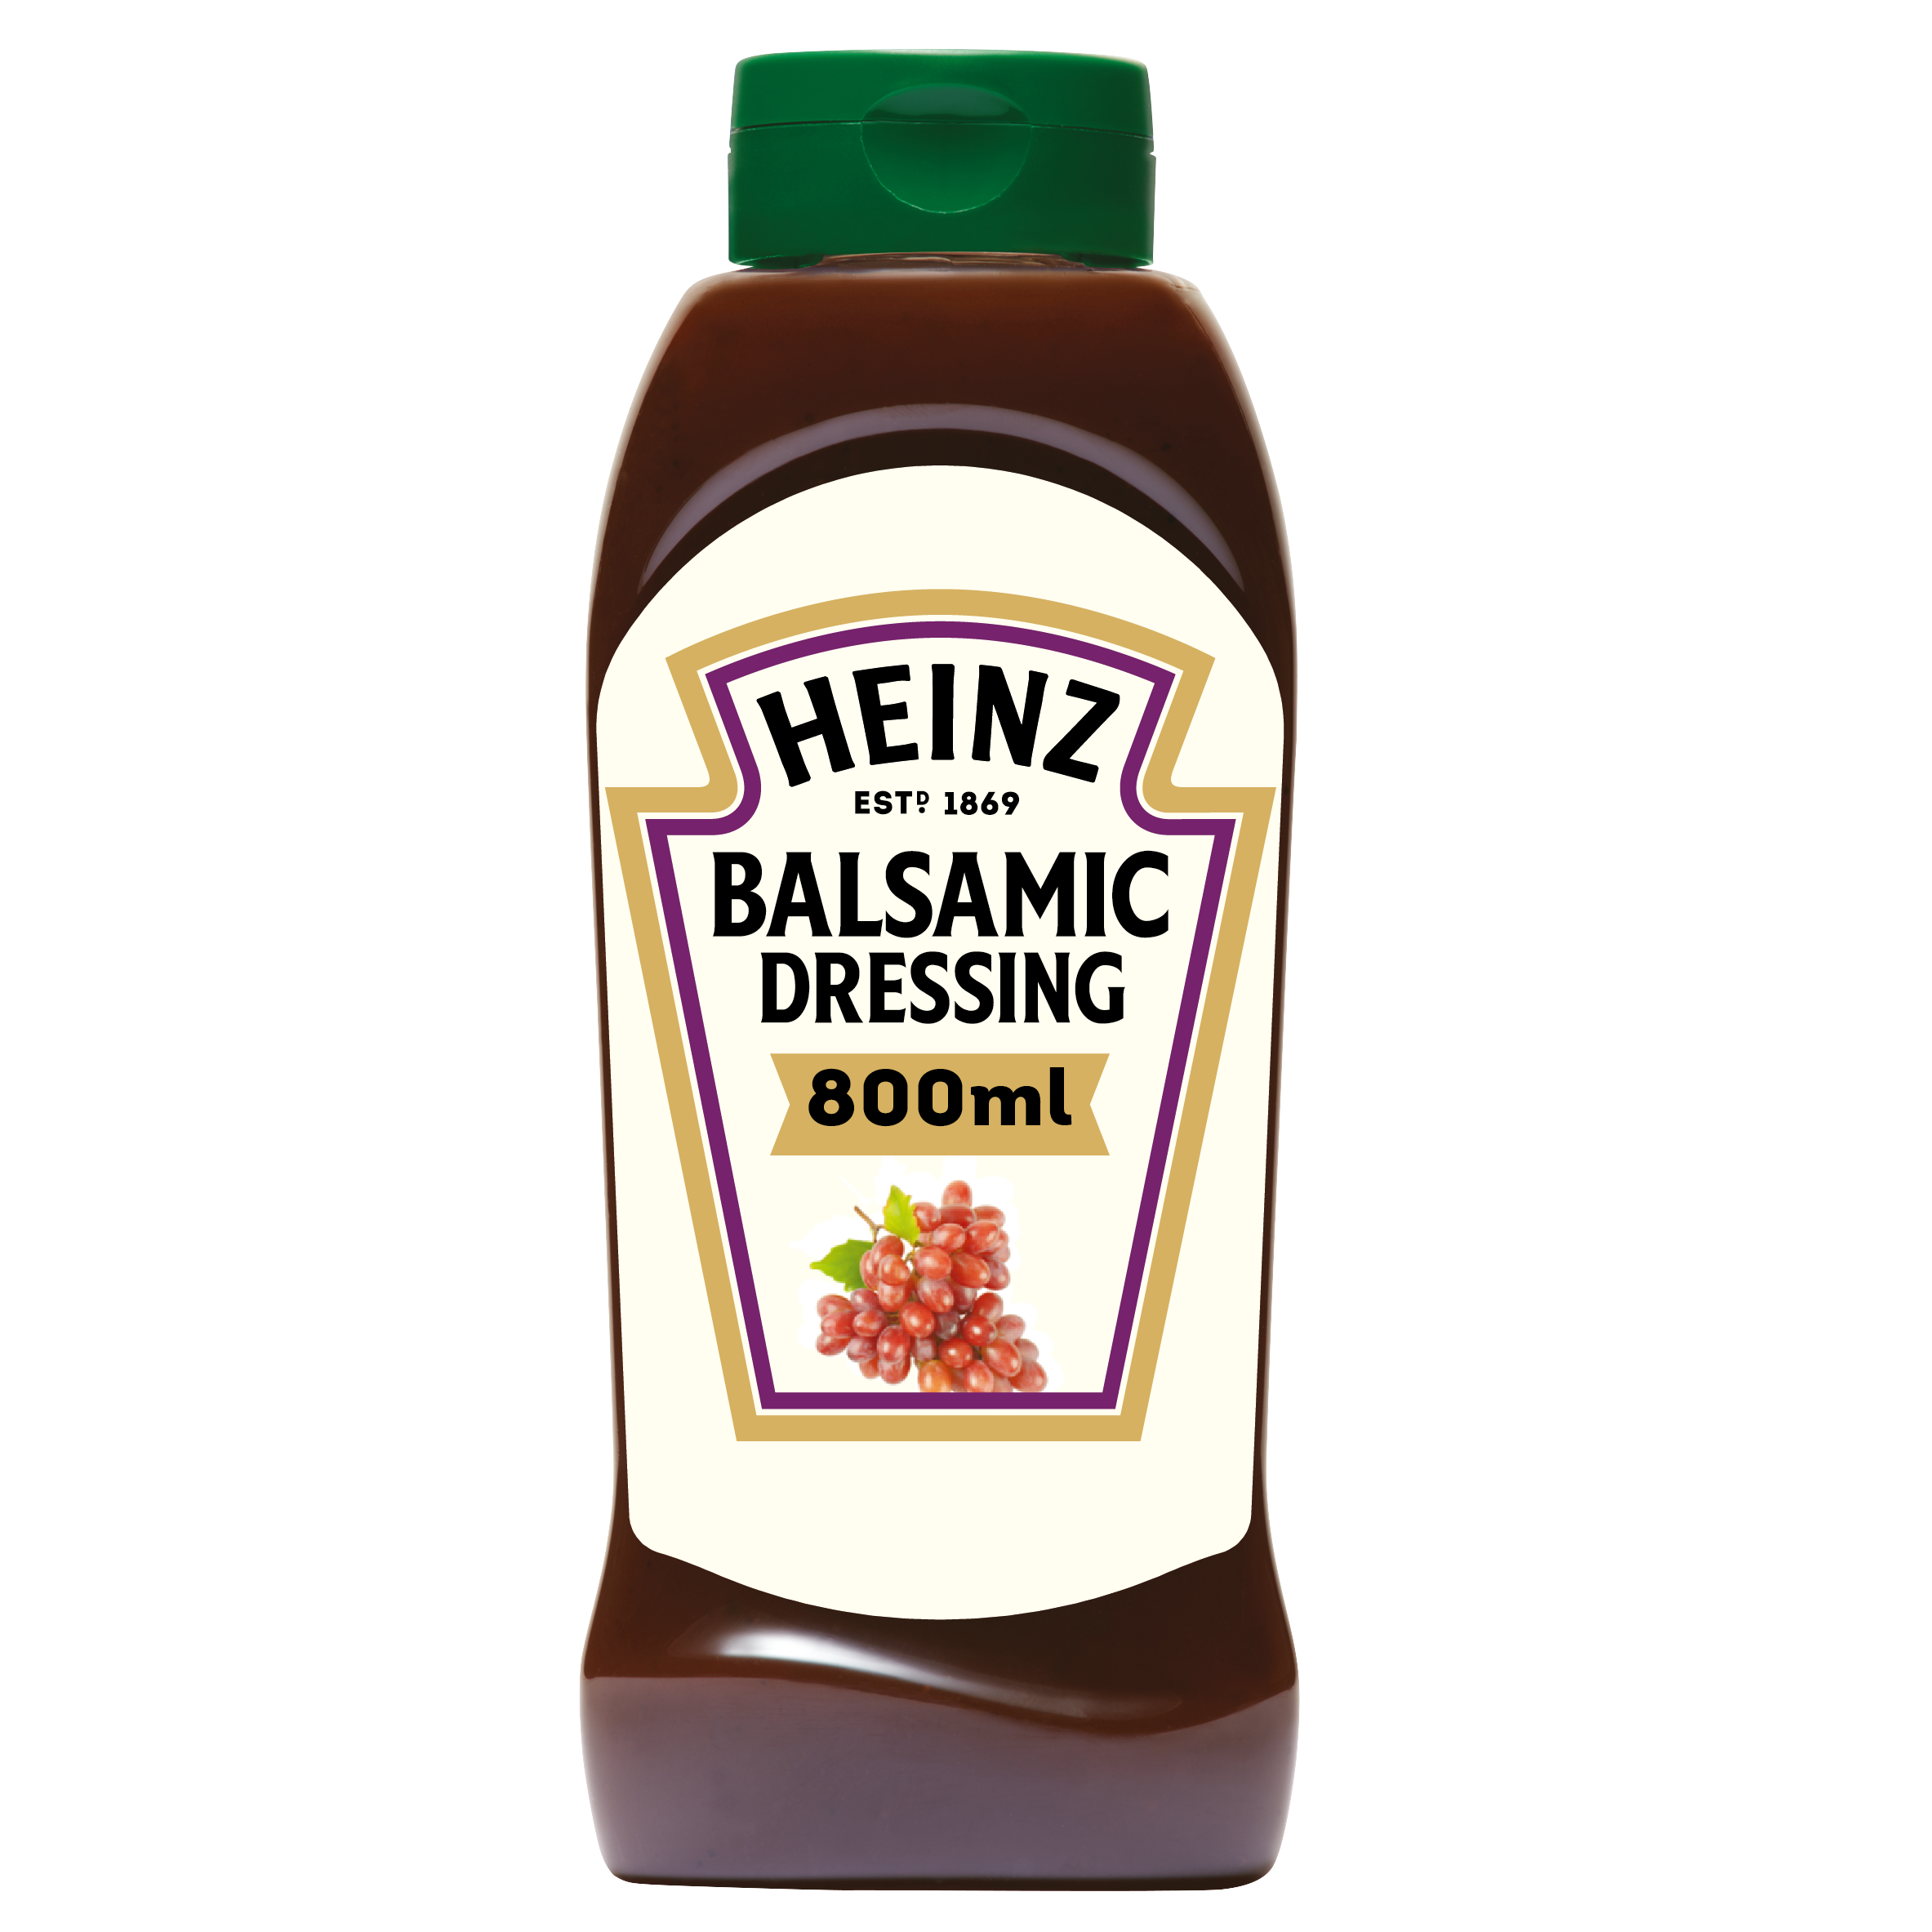 Heinz Balsamico Dressing fles 800ml image